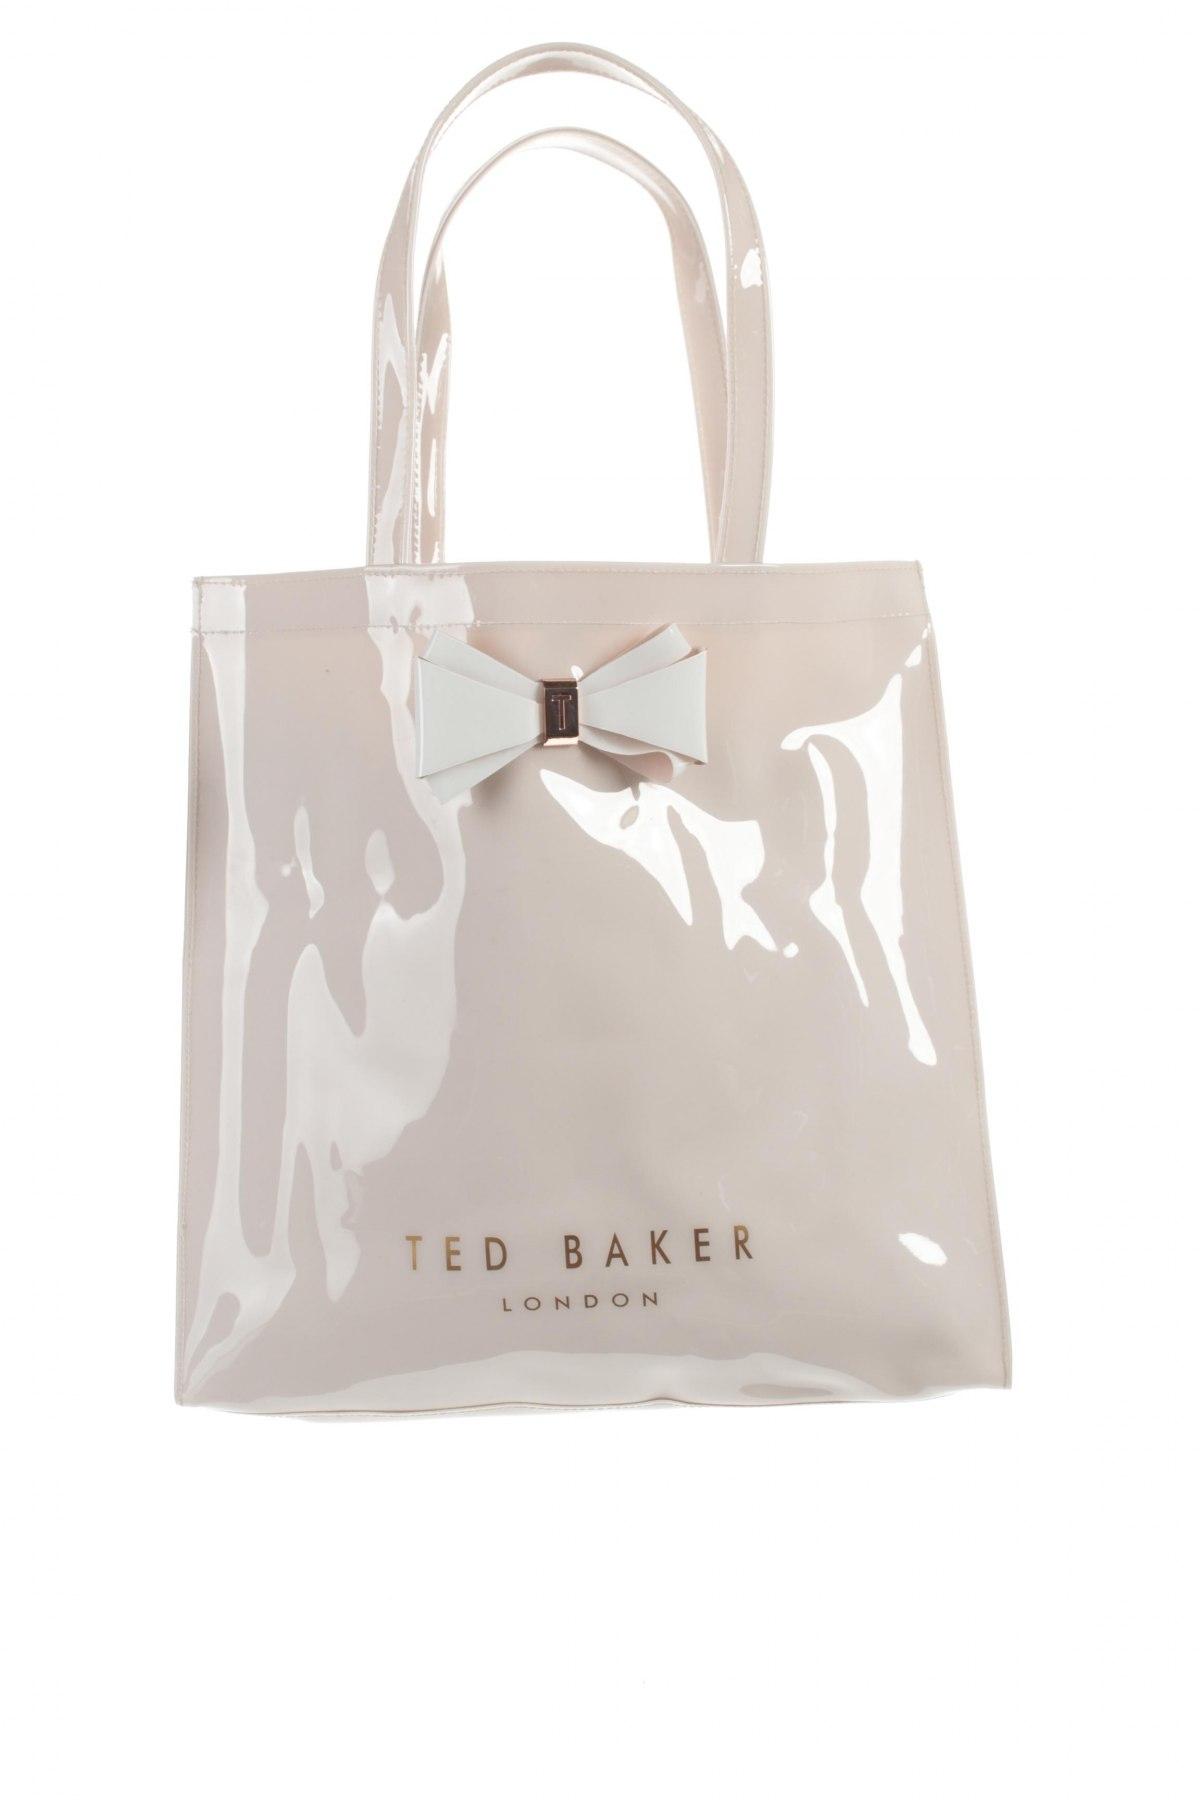 47281a75f6 Γυναικεία τσάντα Ted Baker - σε συμφέρουσα τιμή στο Remix -  8370785